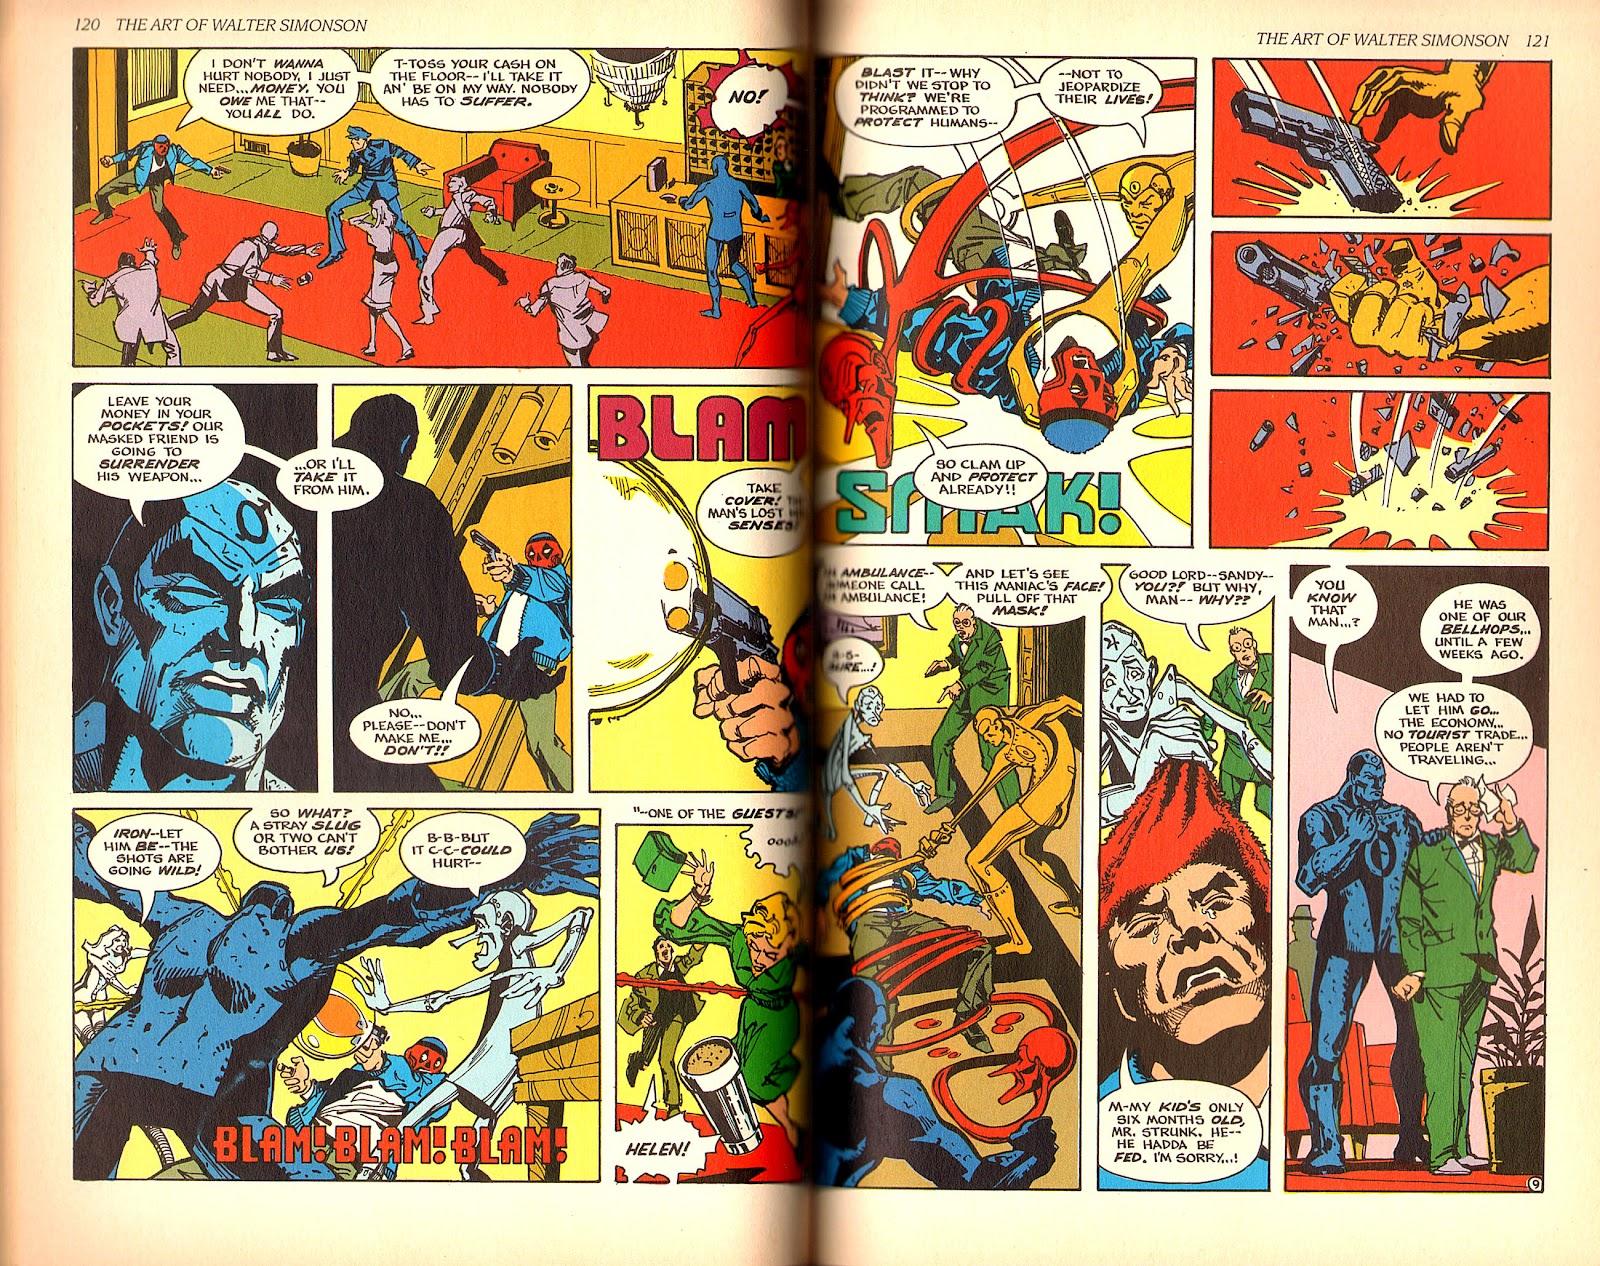 Read online The Art of Walter Simonson comic -  Issue # TPB - 62